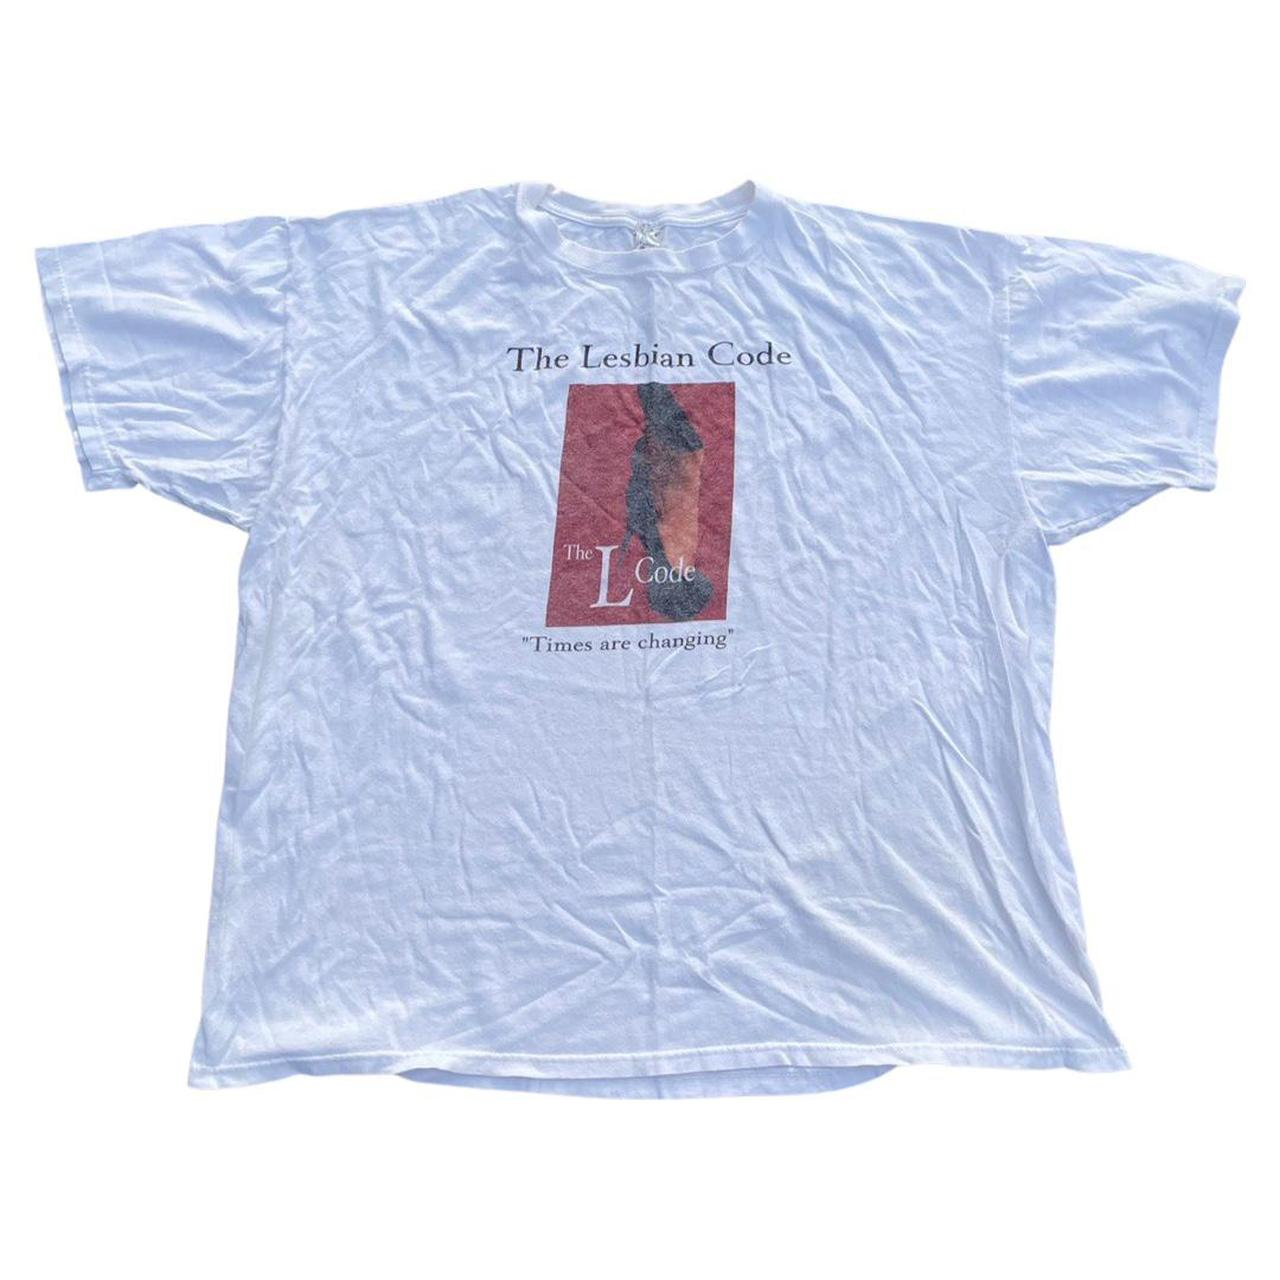 Product Image 1 - Vintage lesbian Code shirt LGBT